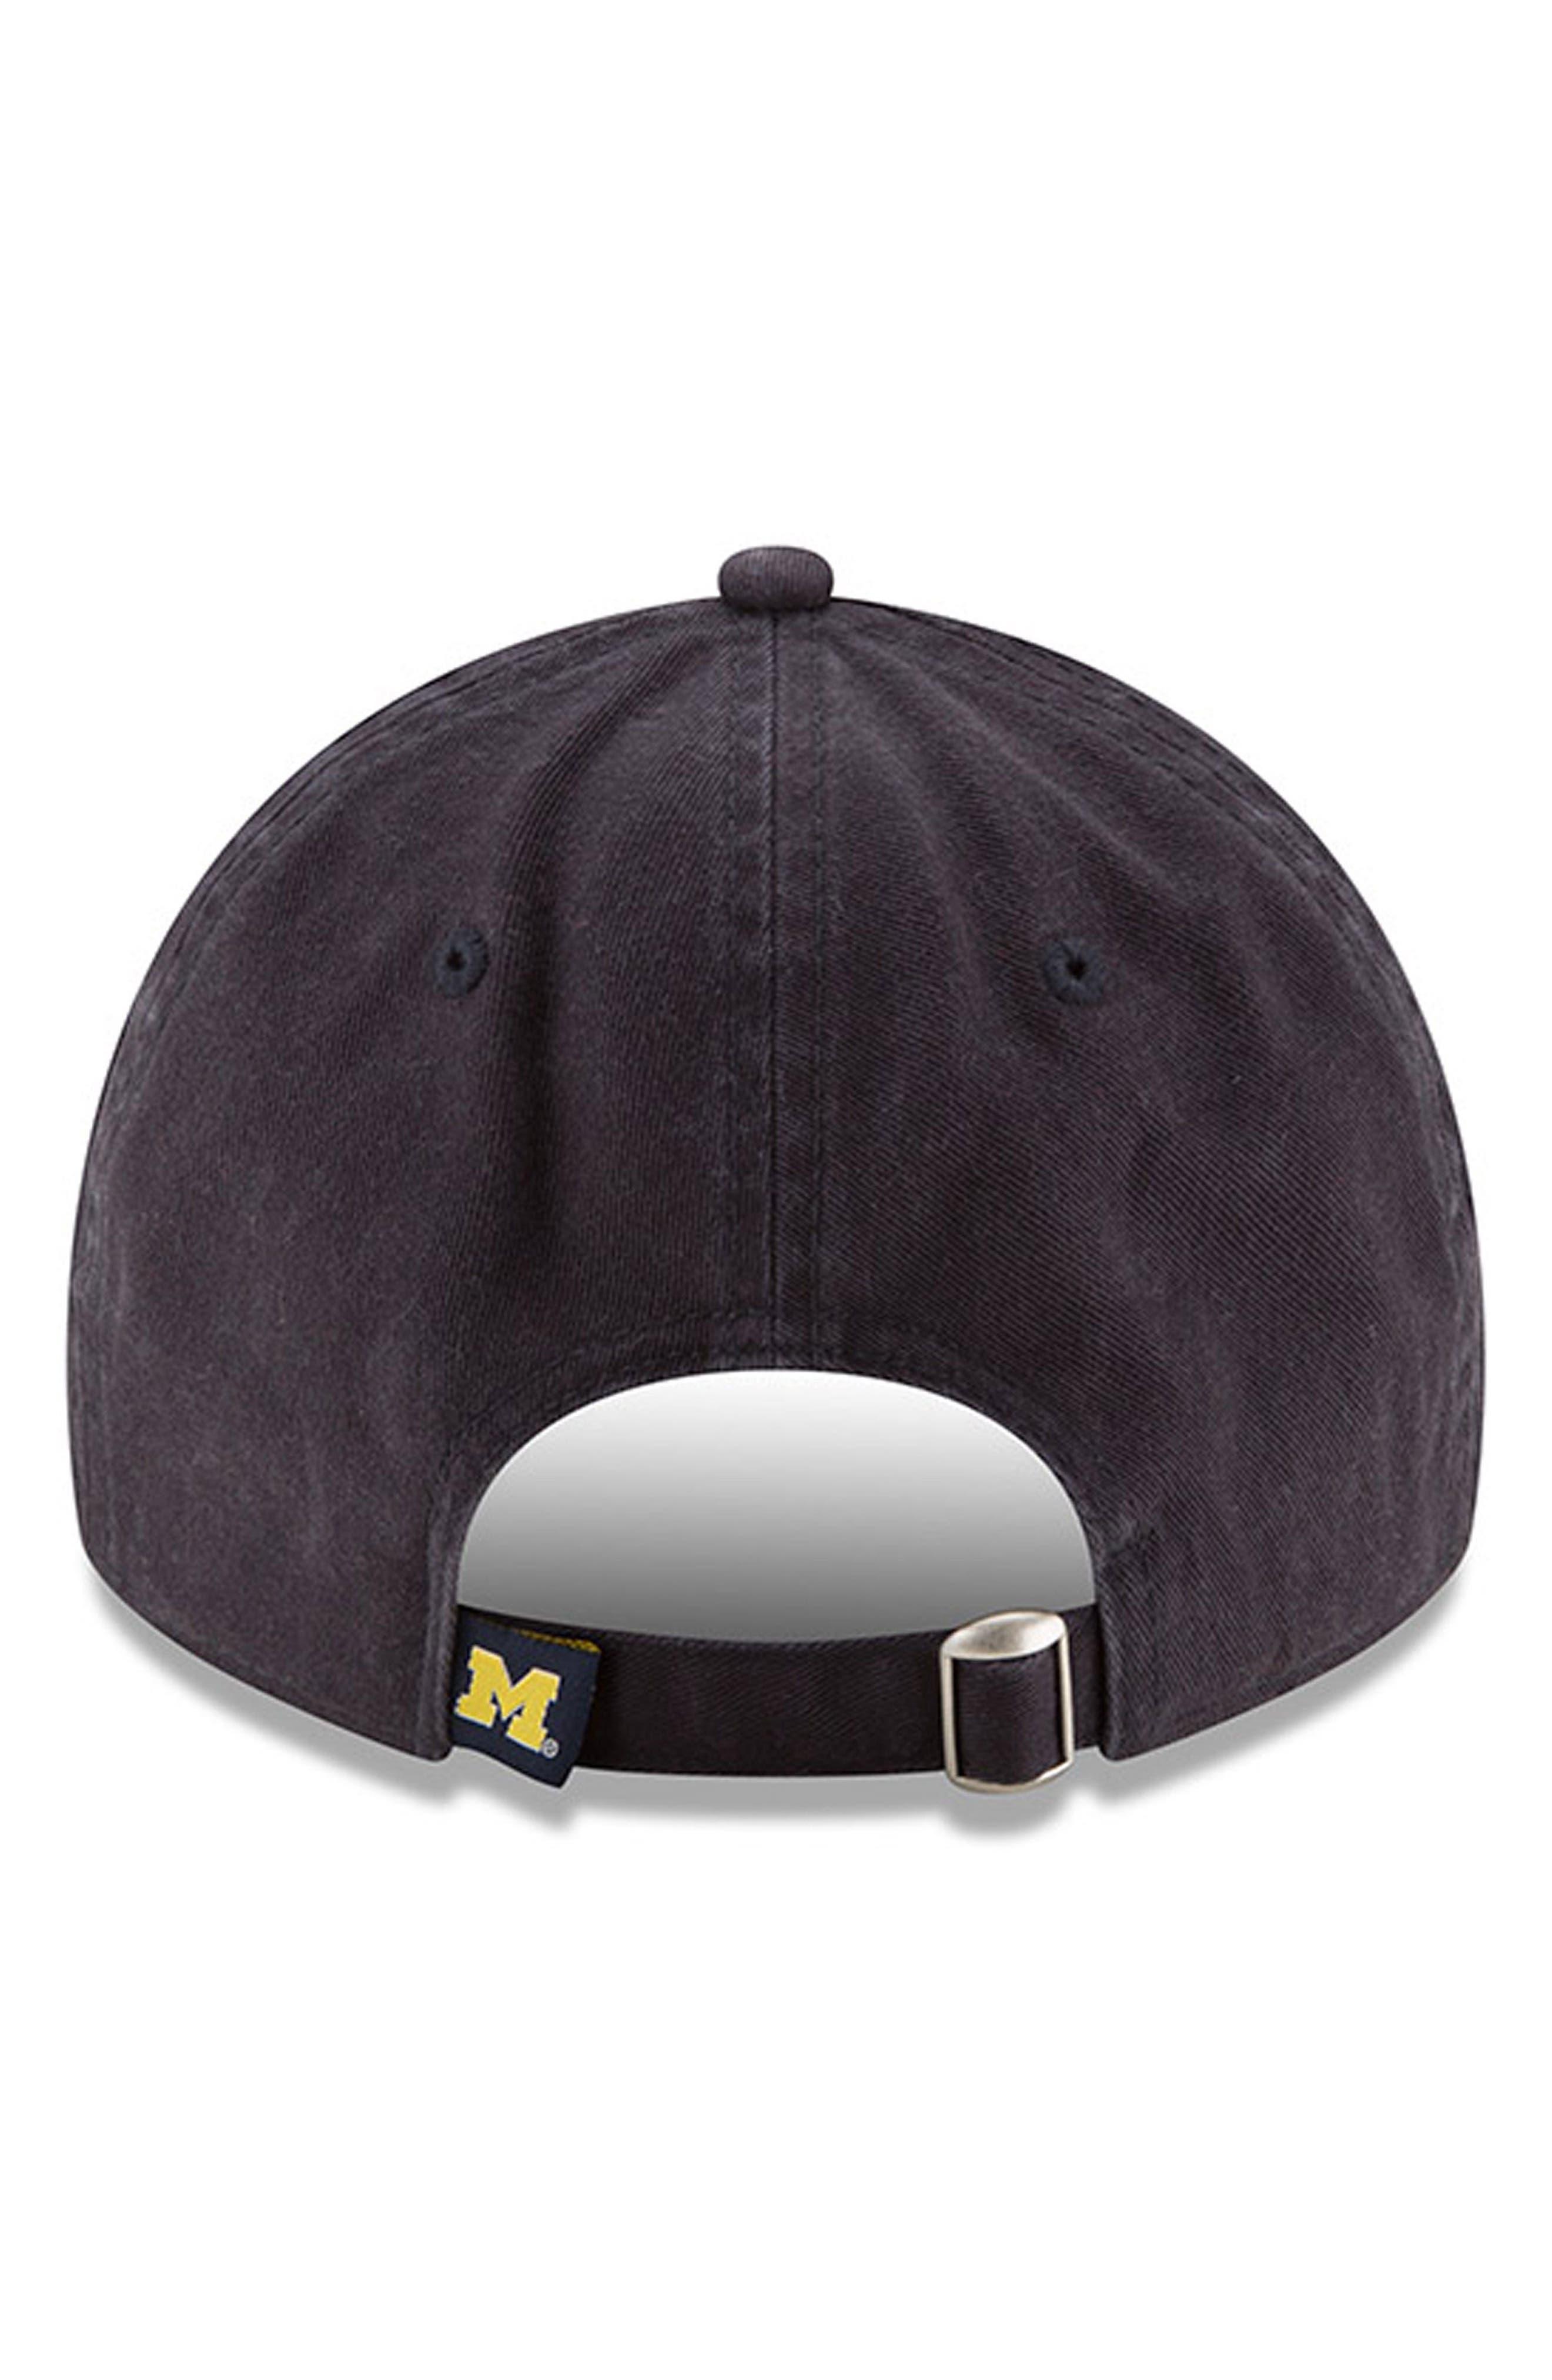 New Era Collegiate Core Classic - Michigan Wolverines Baseball Cap,                             Alternate thumbnail 2, color,                             Michigan Wolverines